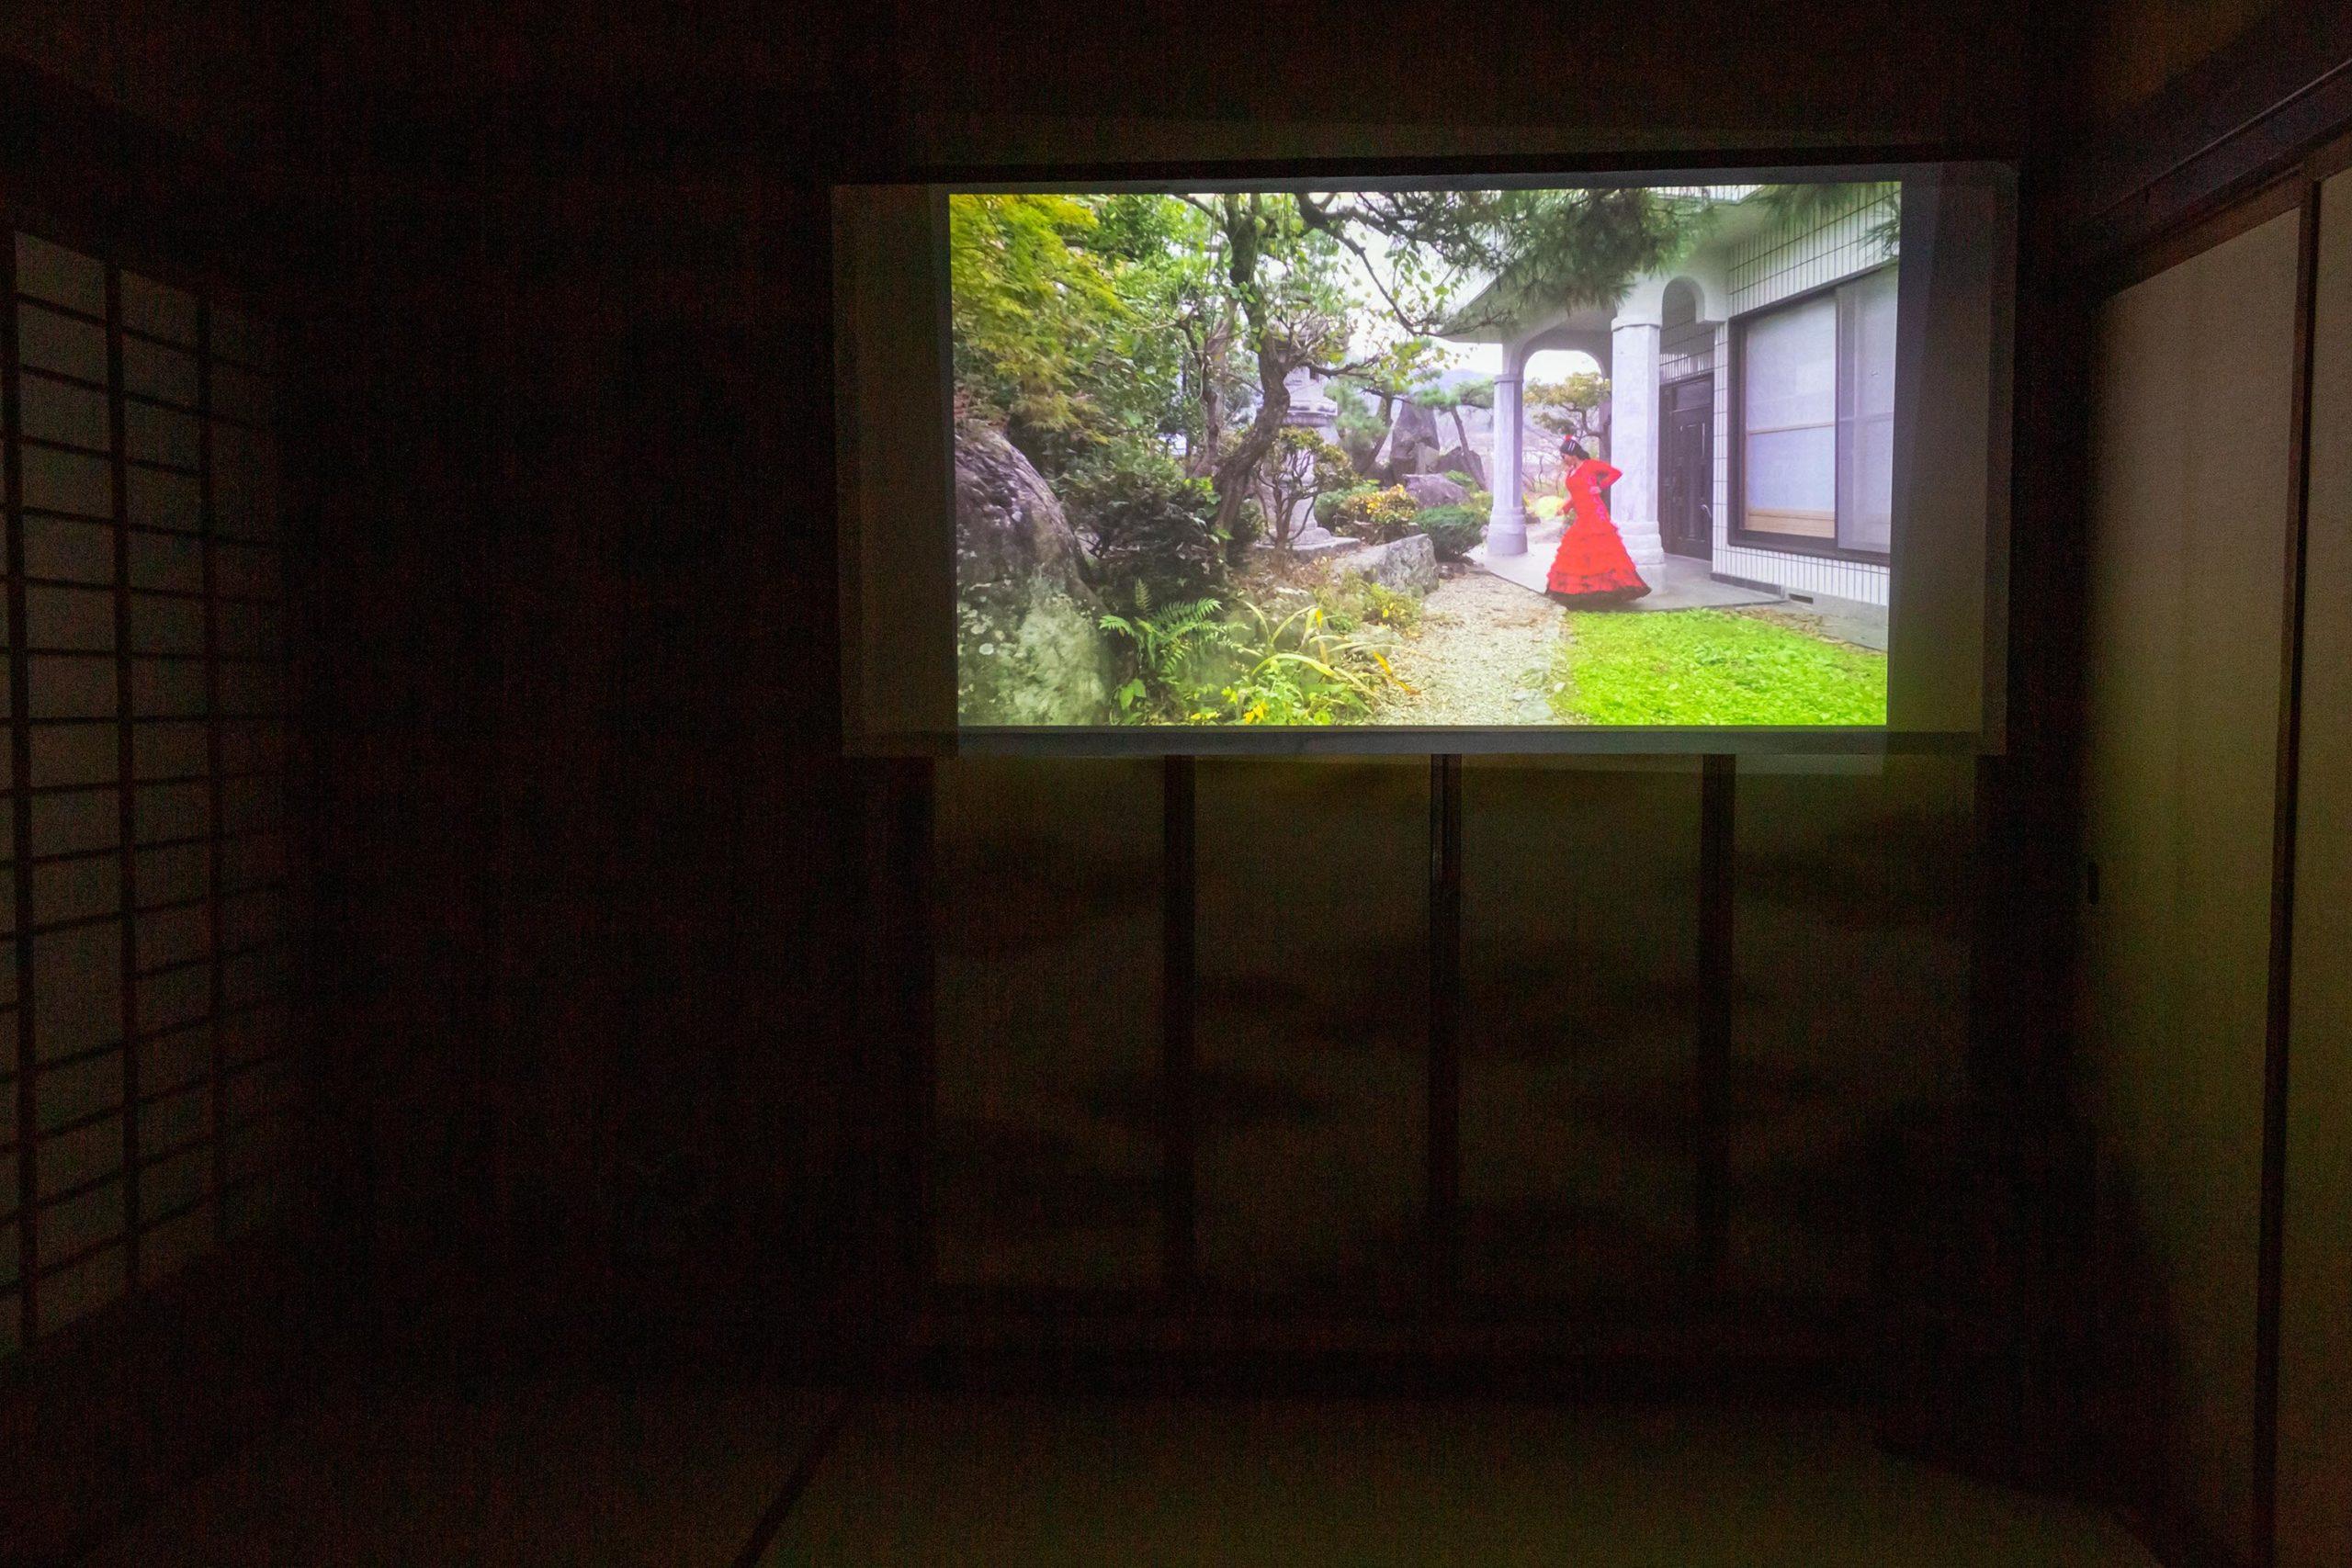 Yaara Parness flamenco-inspired film in Onishi Japan art residency exhibition